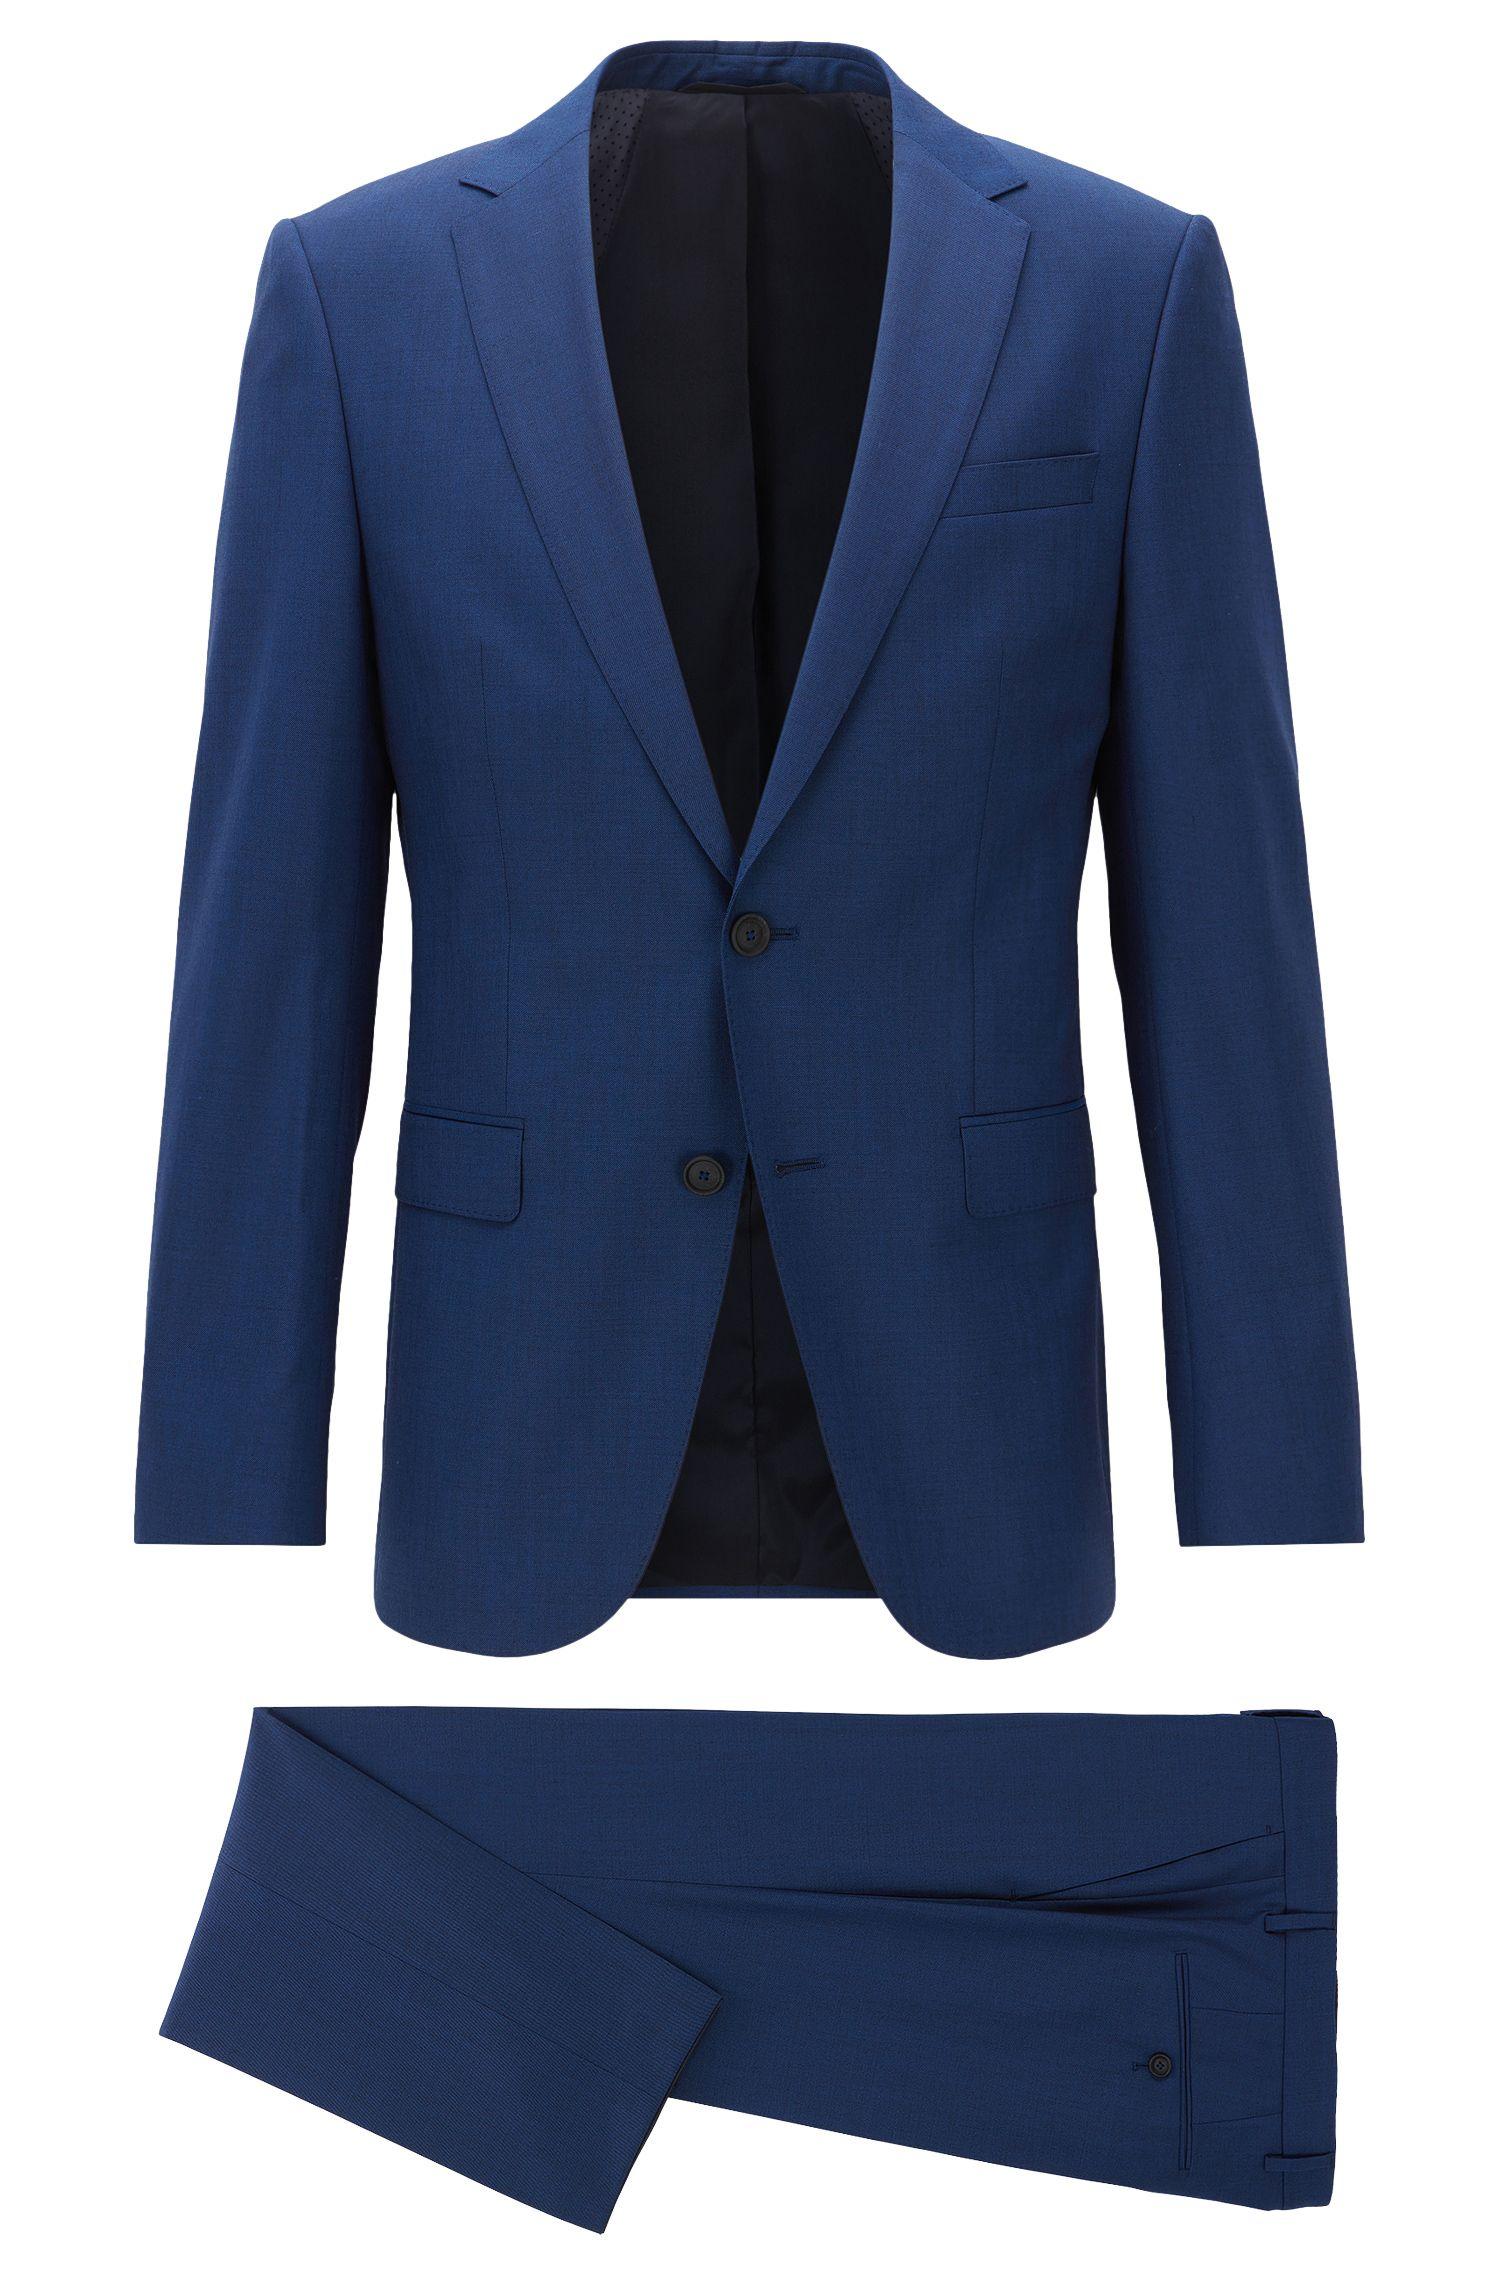 'Nestro/Byte' | Slim Fit, Virgin Wool Travel Suit